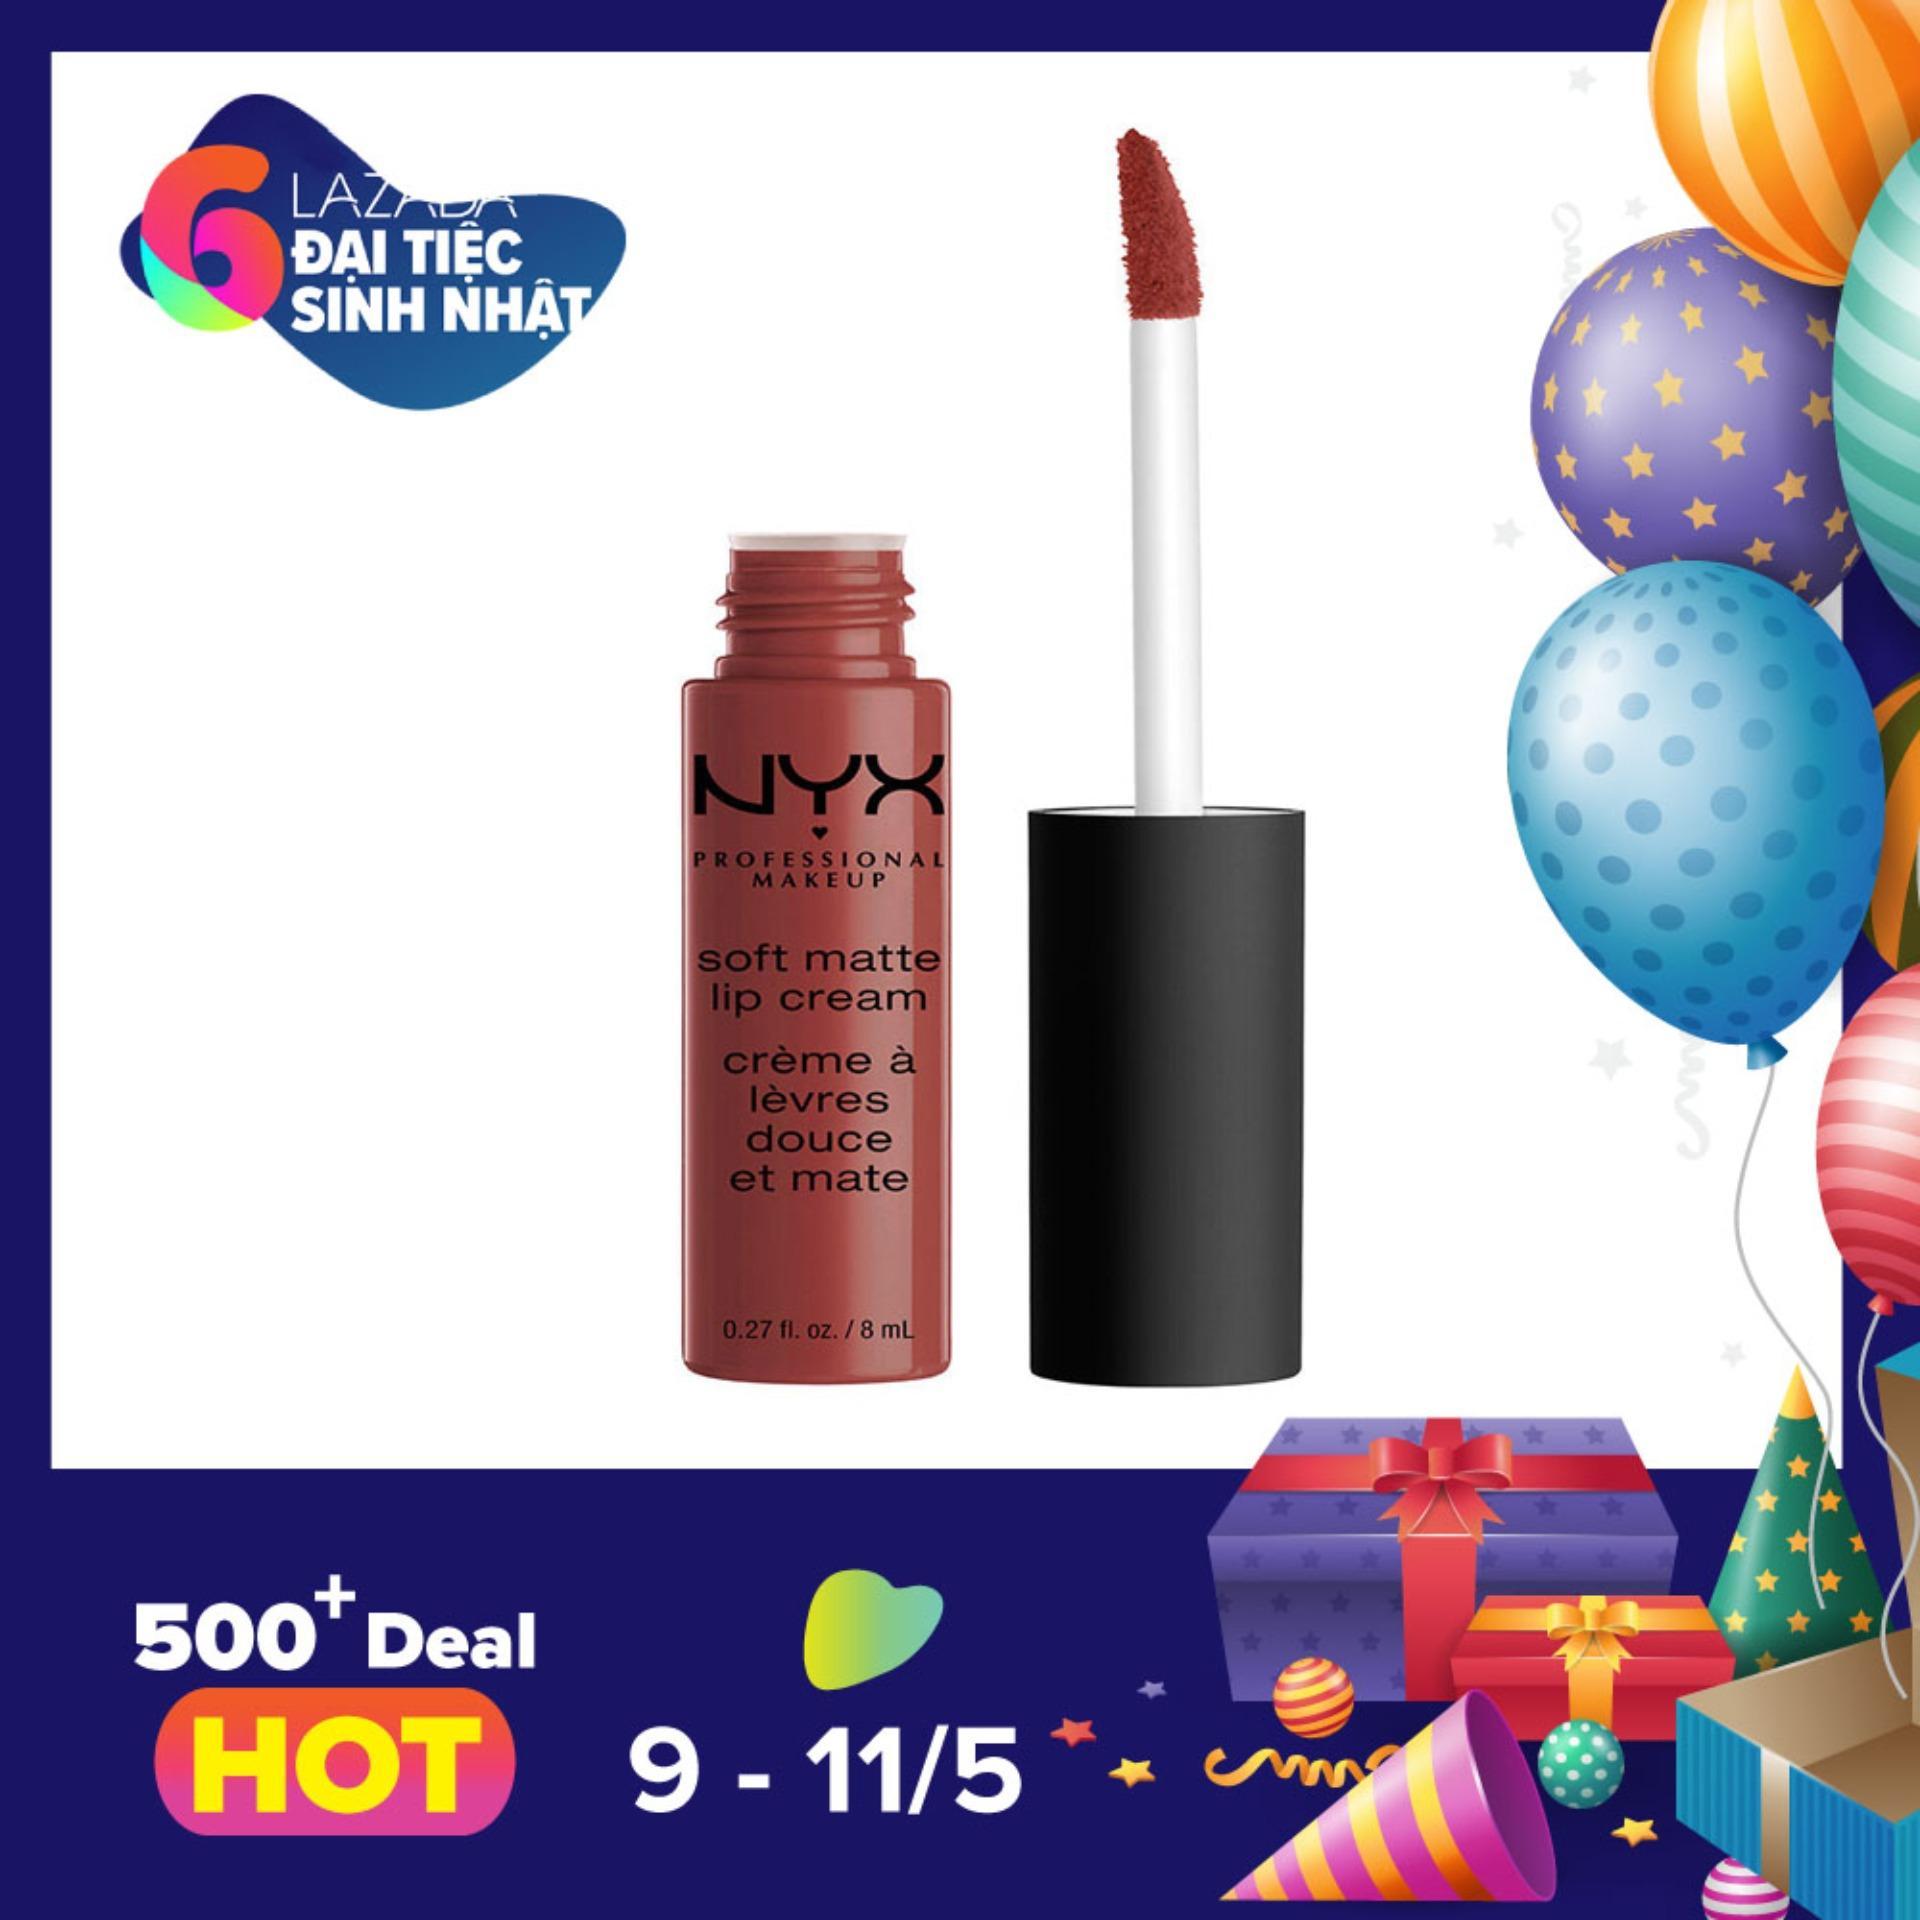 Mua Son Kem Nyx Professional Makeup Soft Matte Lip Cream Smlc32 Rome Nyx Rẻ